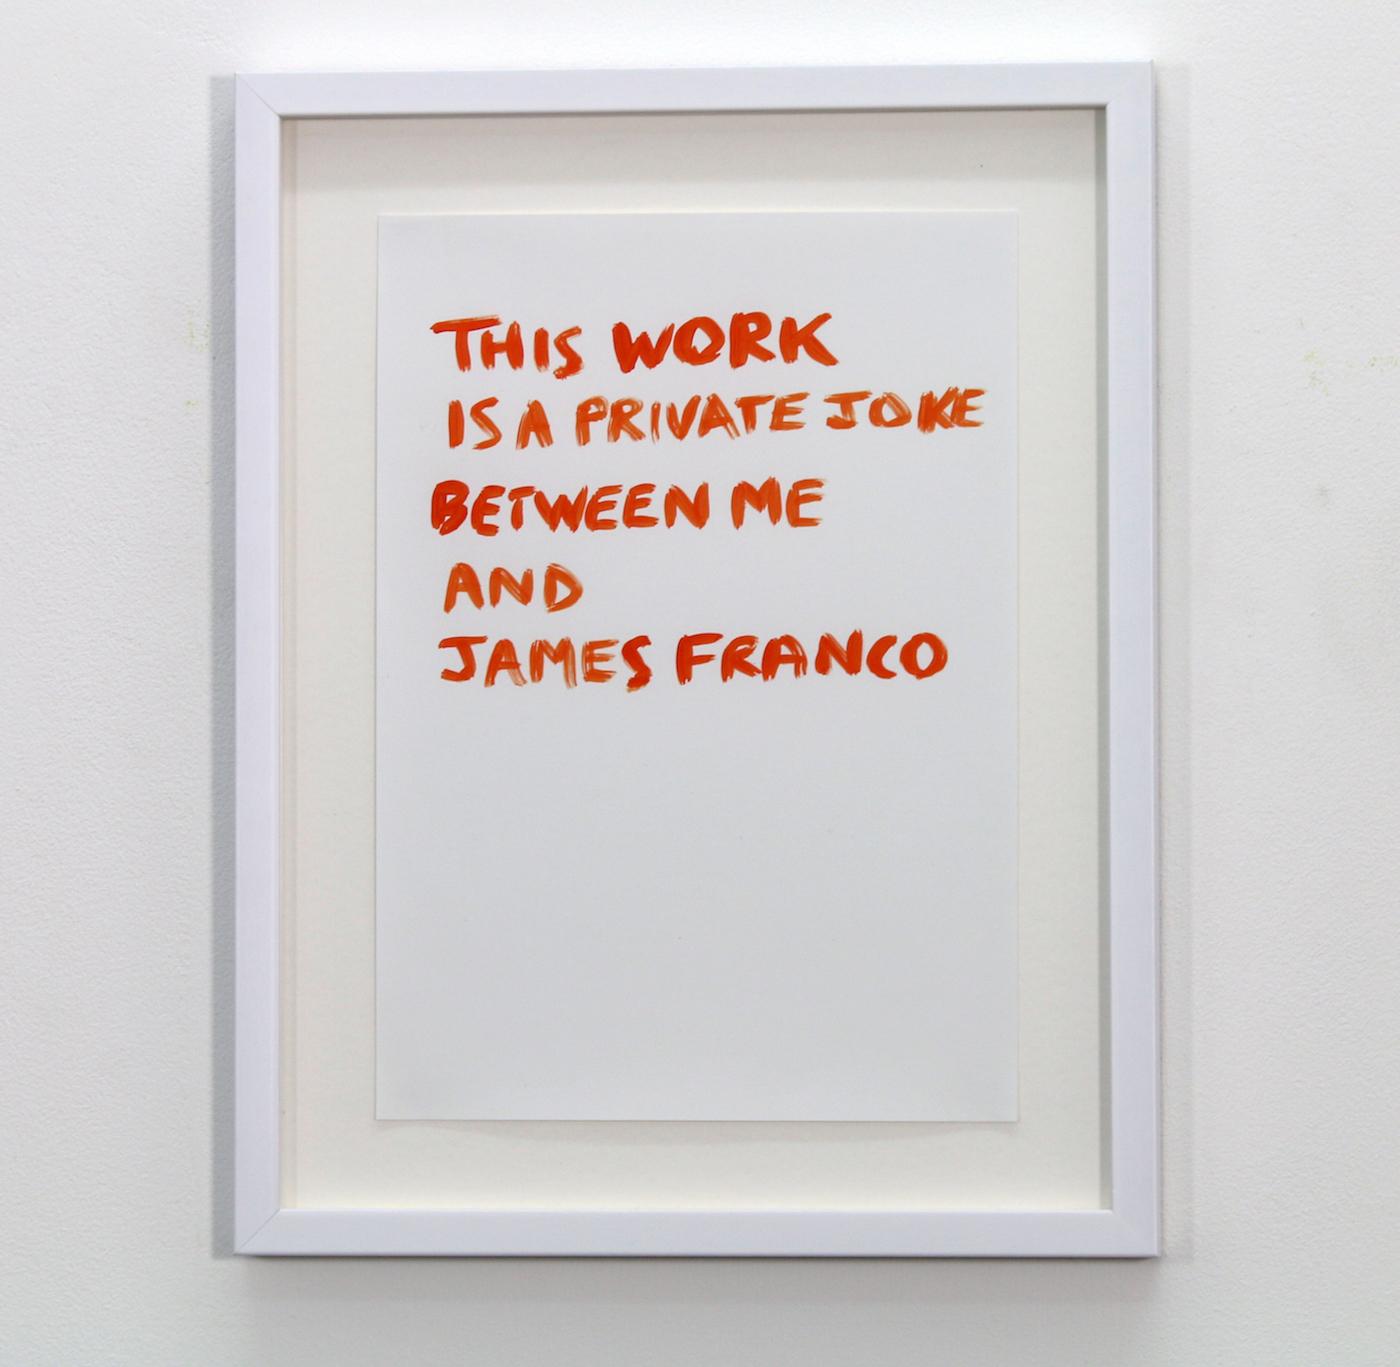 Tim Etchells, Private Joke (James Franco), 2014. Orange acrylic on archival paper. Framed. 29.7 x 21 cm.